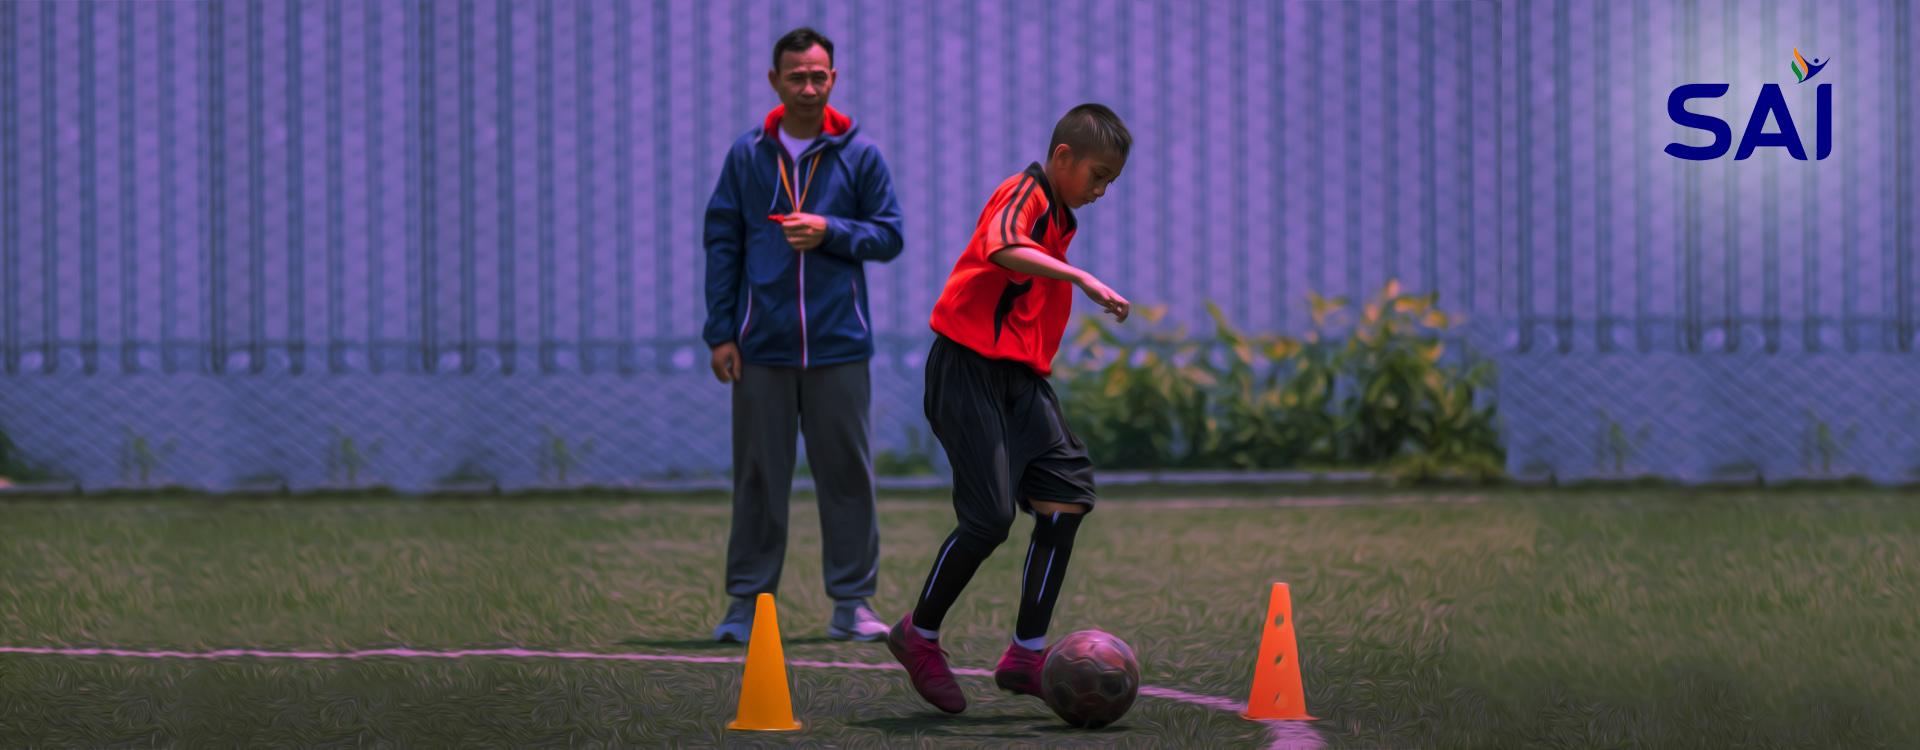 Tokyo Olympics India at Olympics High-Performance Coach Education Programme